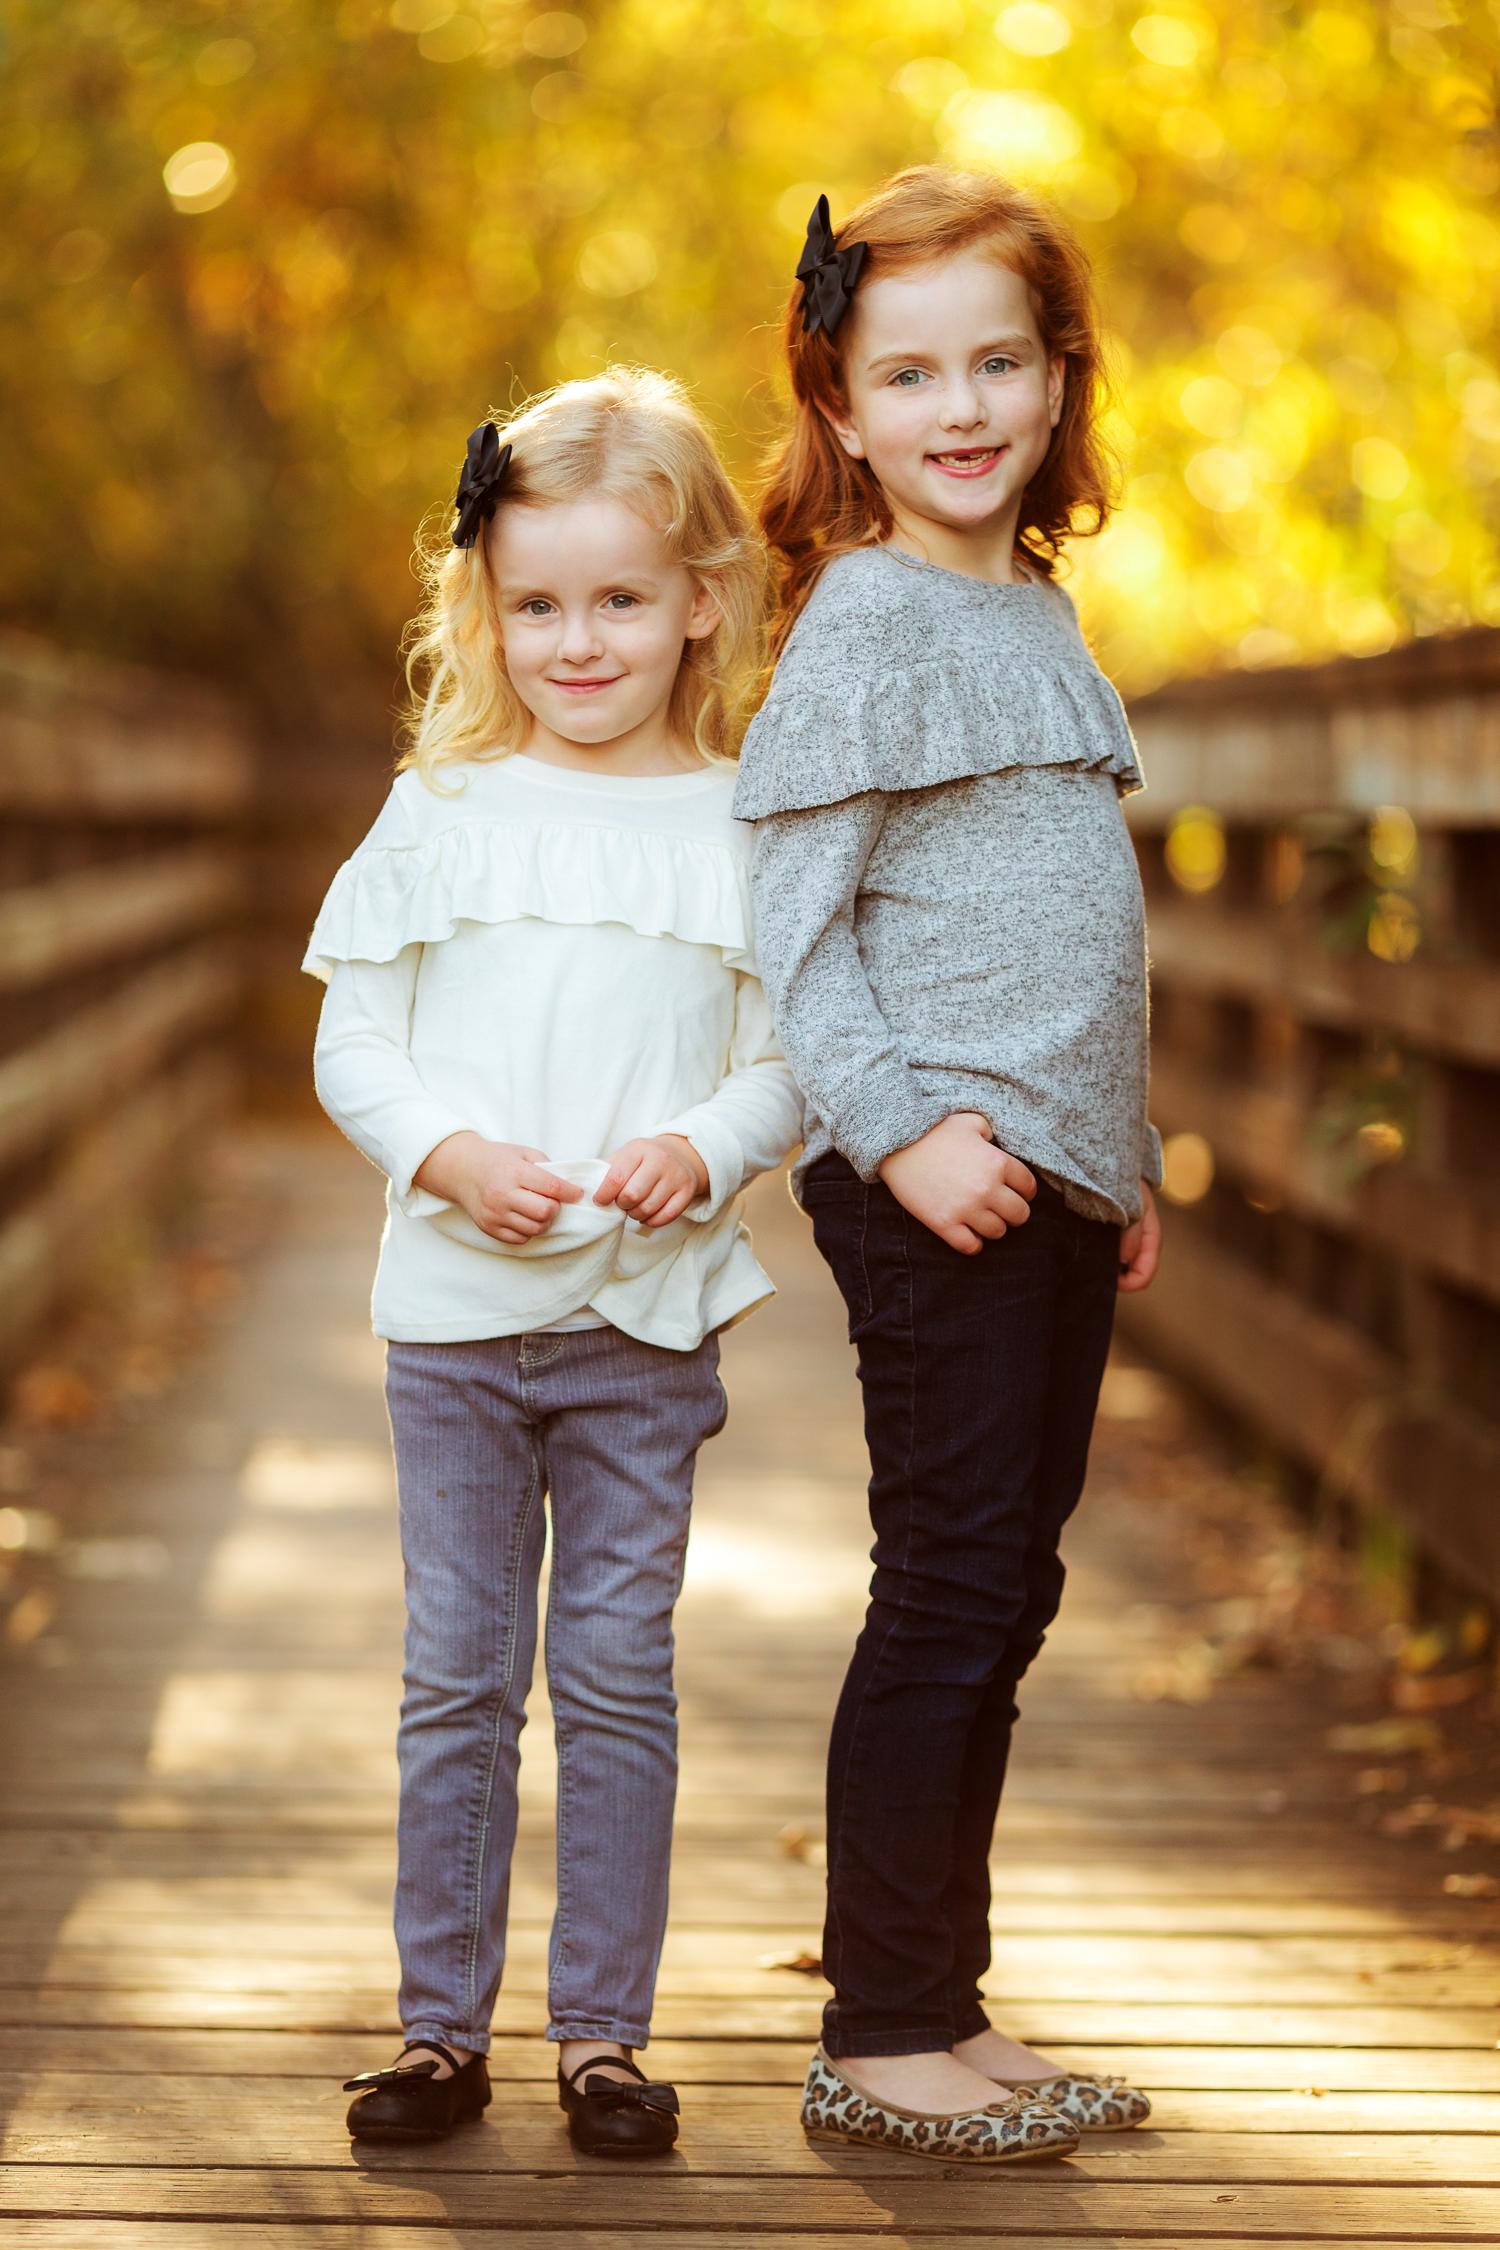 ariellanoellephotography-family-portrait-session-fall-mini-photographer-seniors-highschool-portraiture-child-photographer-1-8.jpg